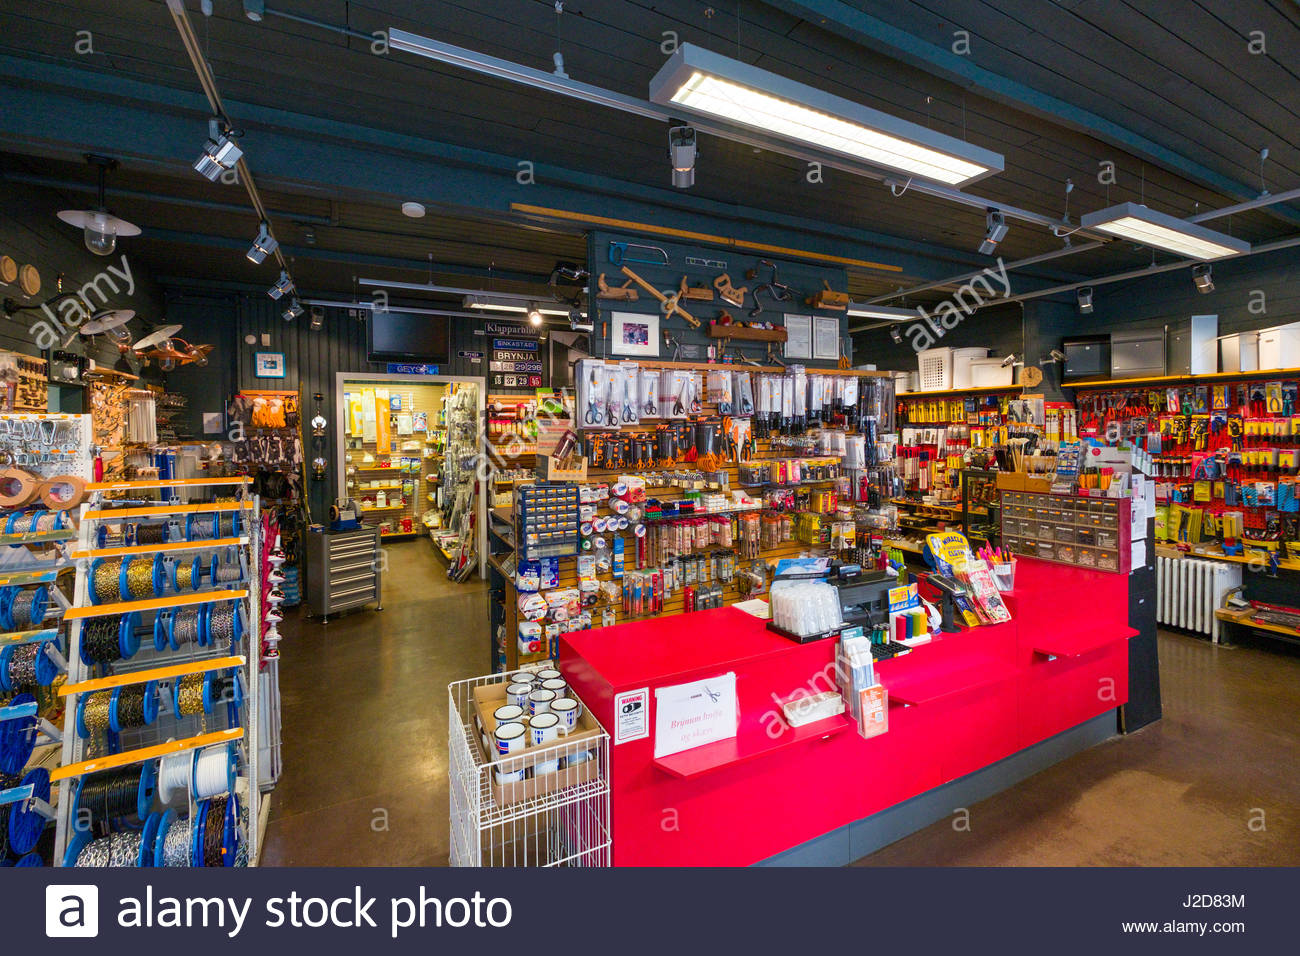 Hardware Store Shelves Stock Photos & Hardware Store ...